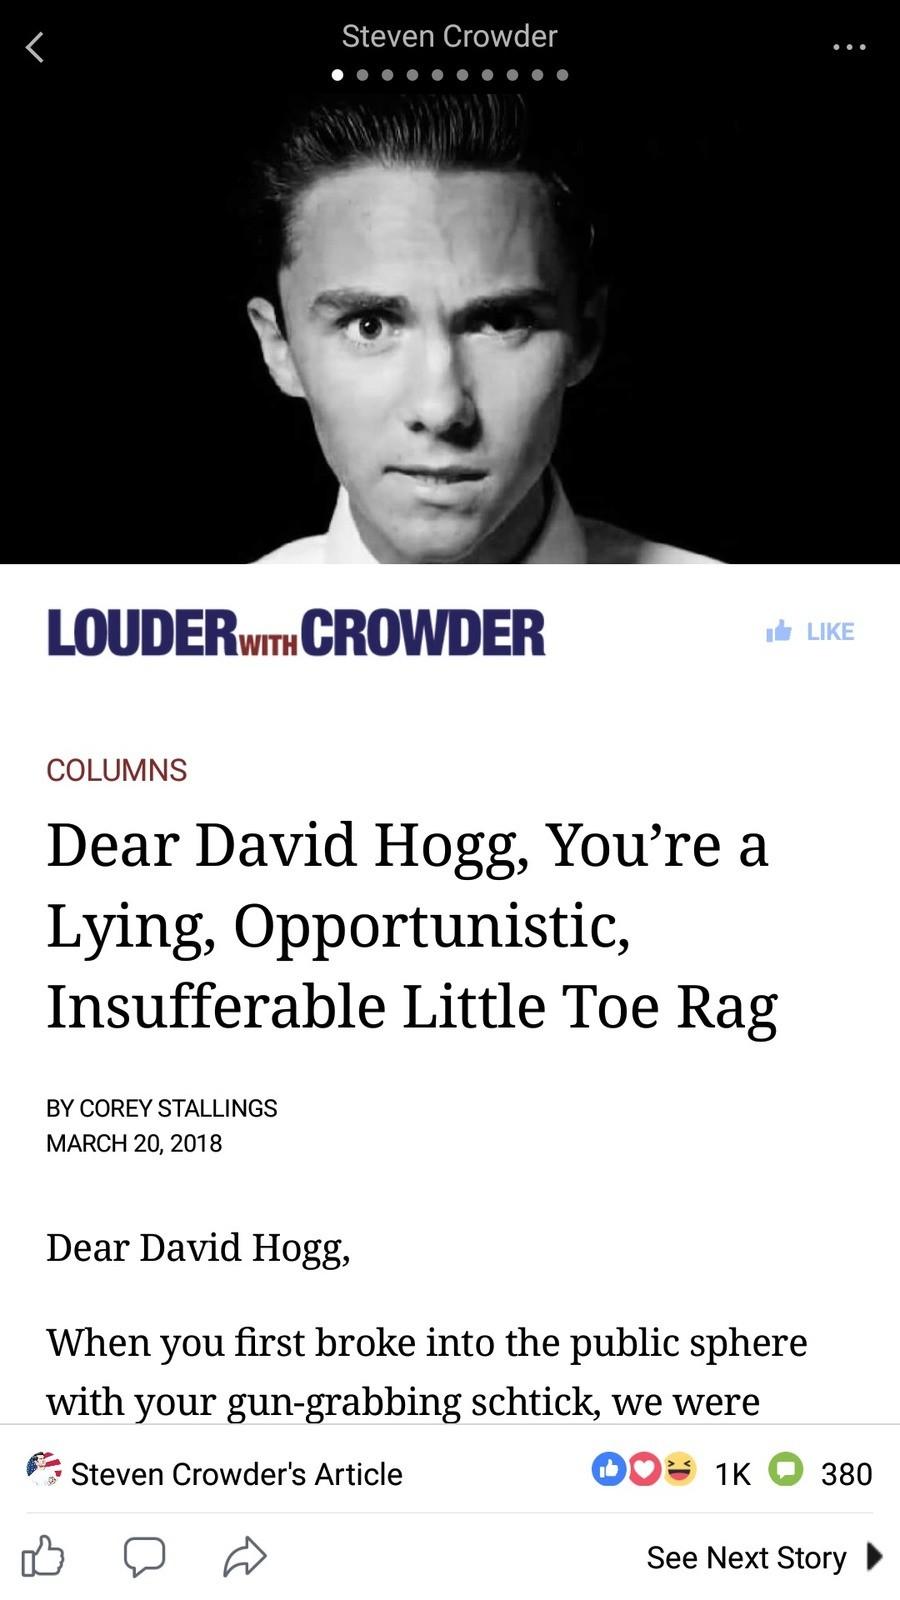 louder with crowder on david hogg